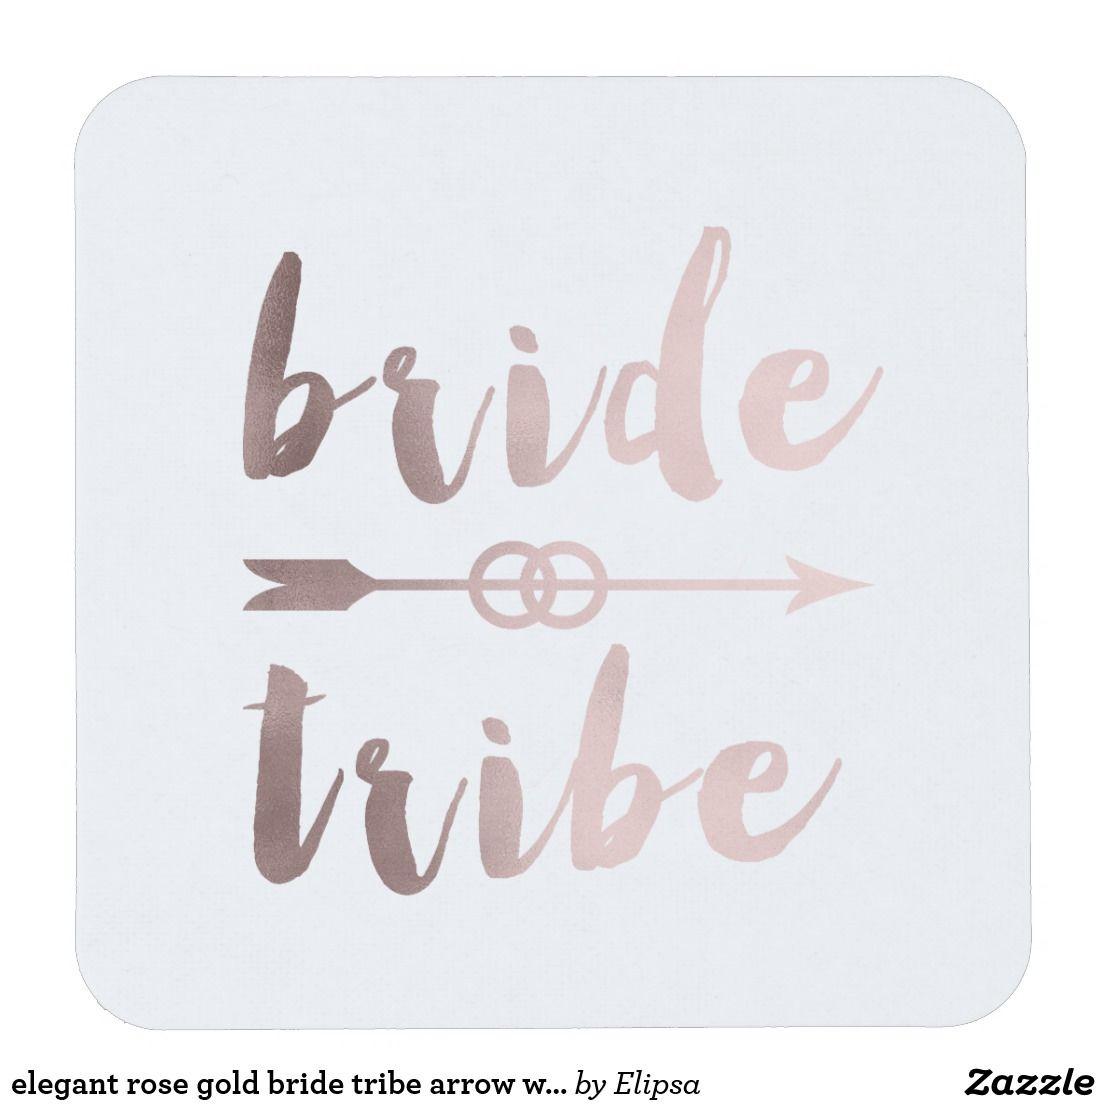 elegant rose gold bride tribe arrow wedding rings square paper